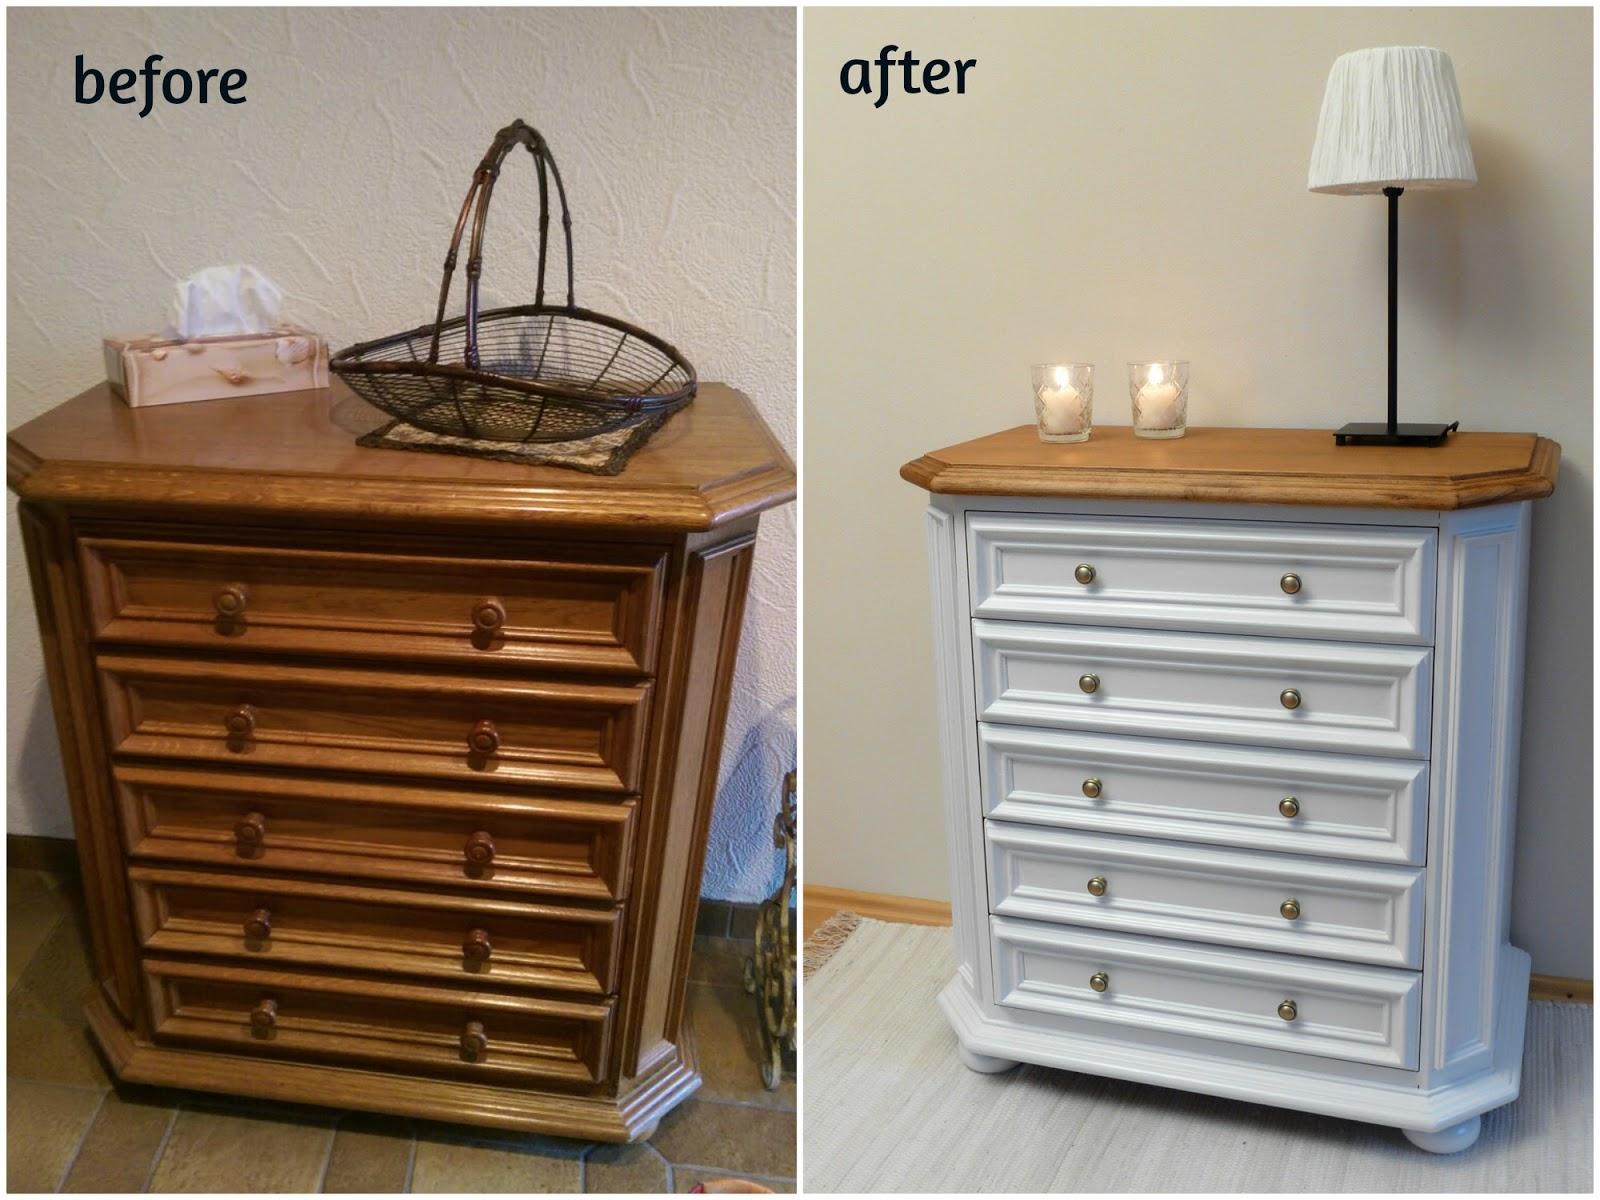 dekoelement rustikale schubladenkommode im neuen look. Black Bedroom Furniture Sets. Home Design Ideas